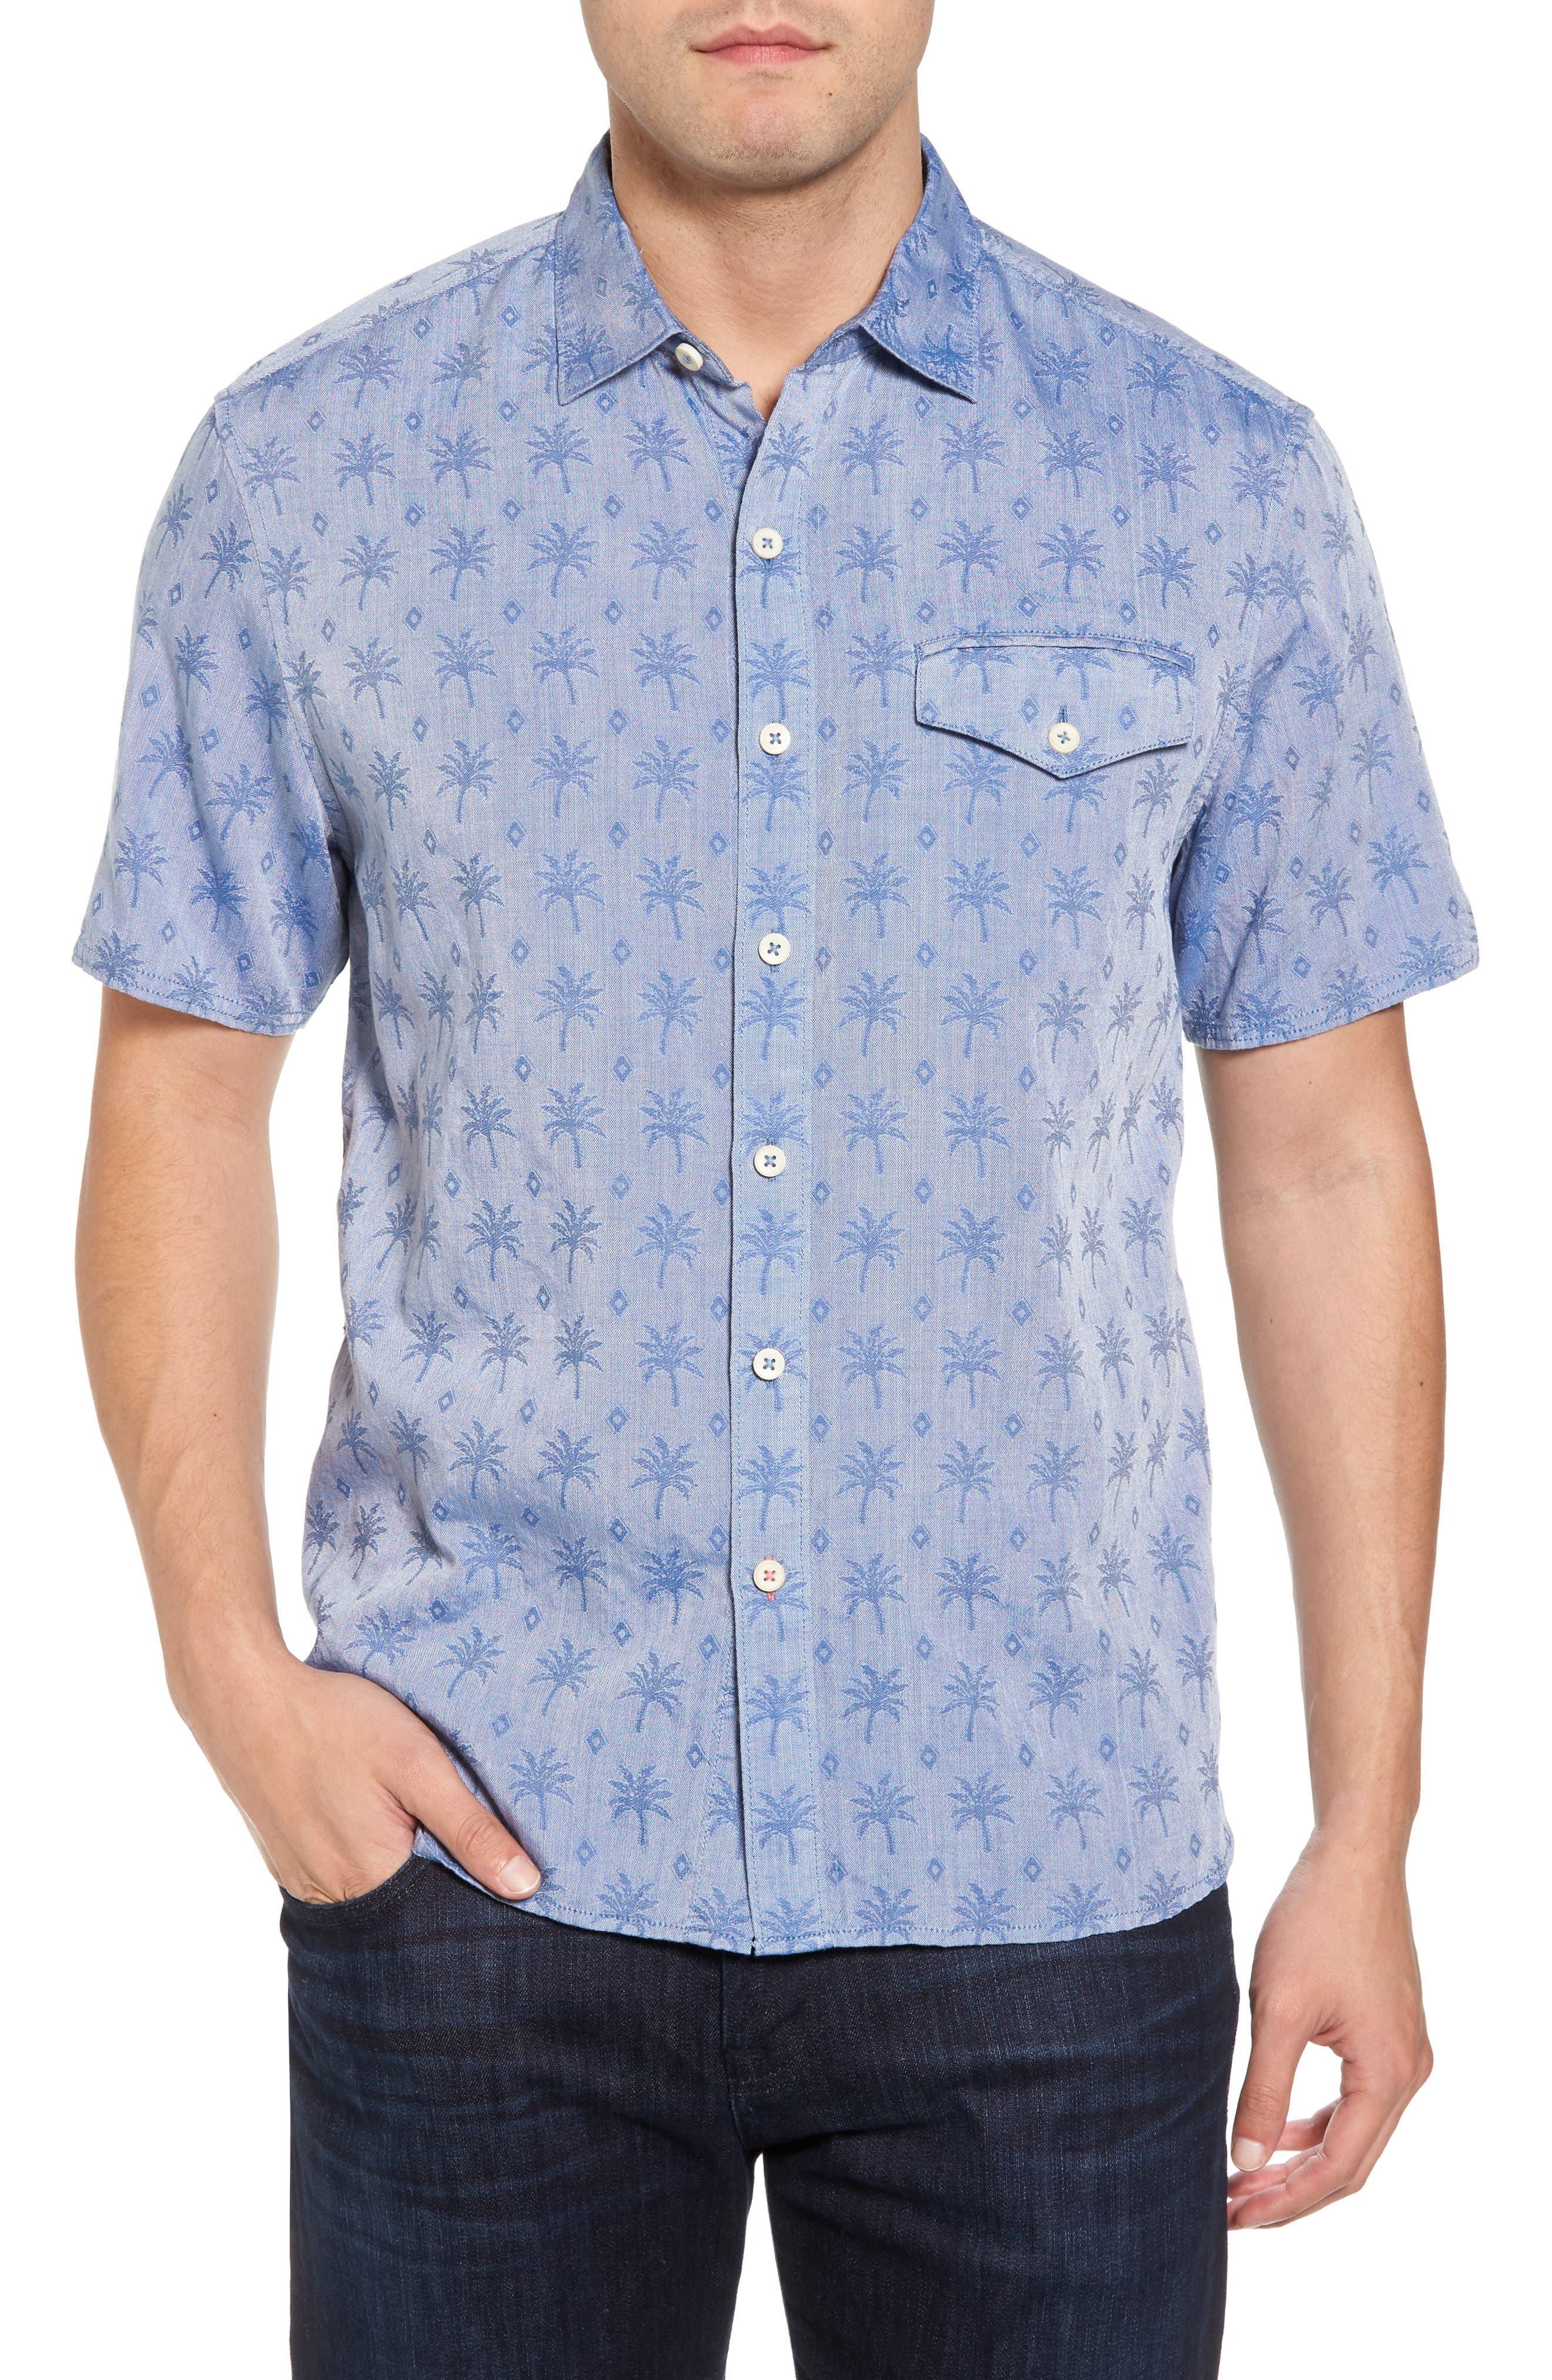 Alternate Image 1 Selected - Tommy Bahama Palm Palm Regular Fit Jacquard Sport Shirt